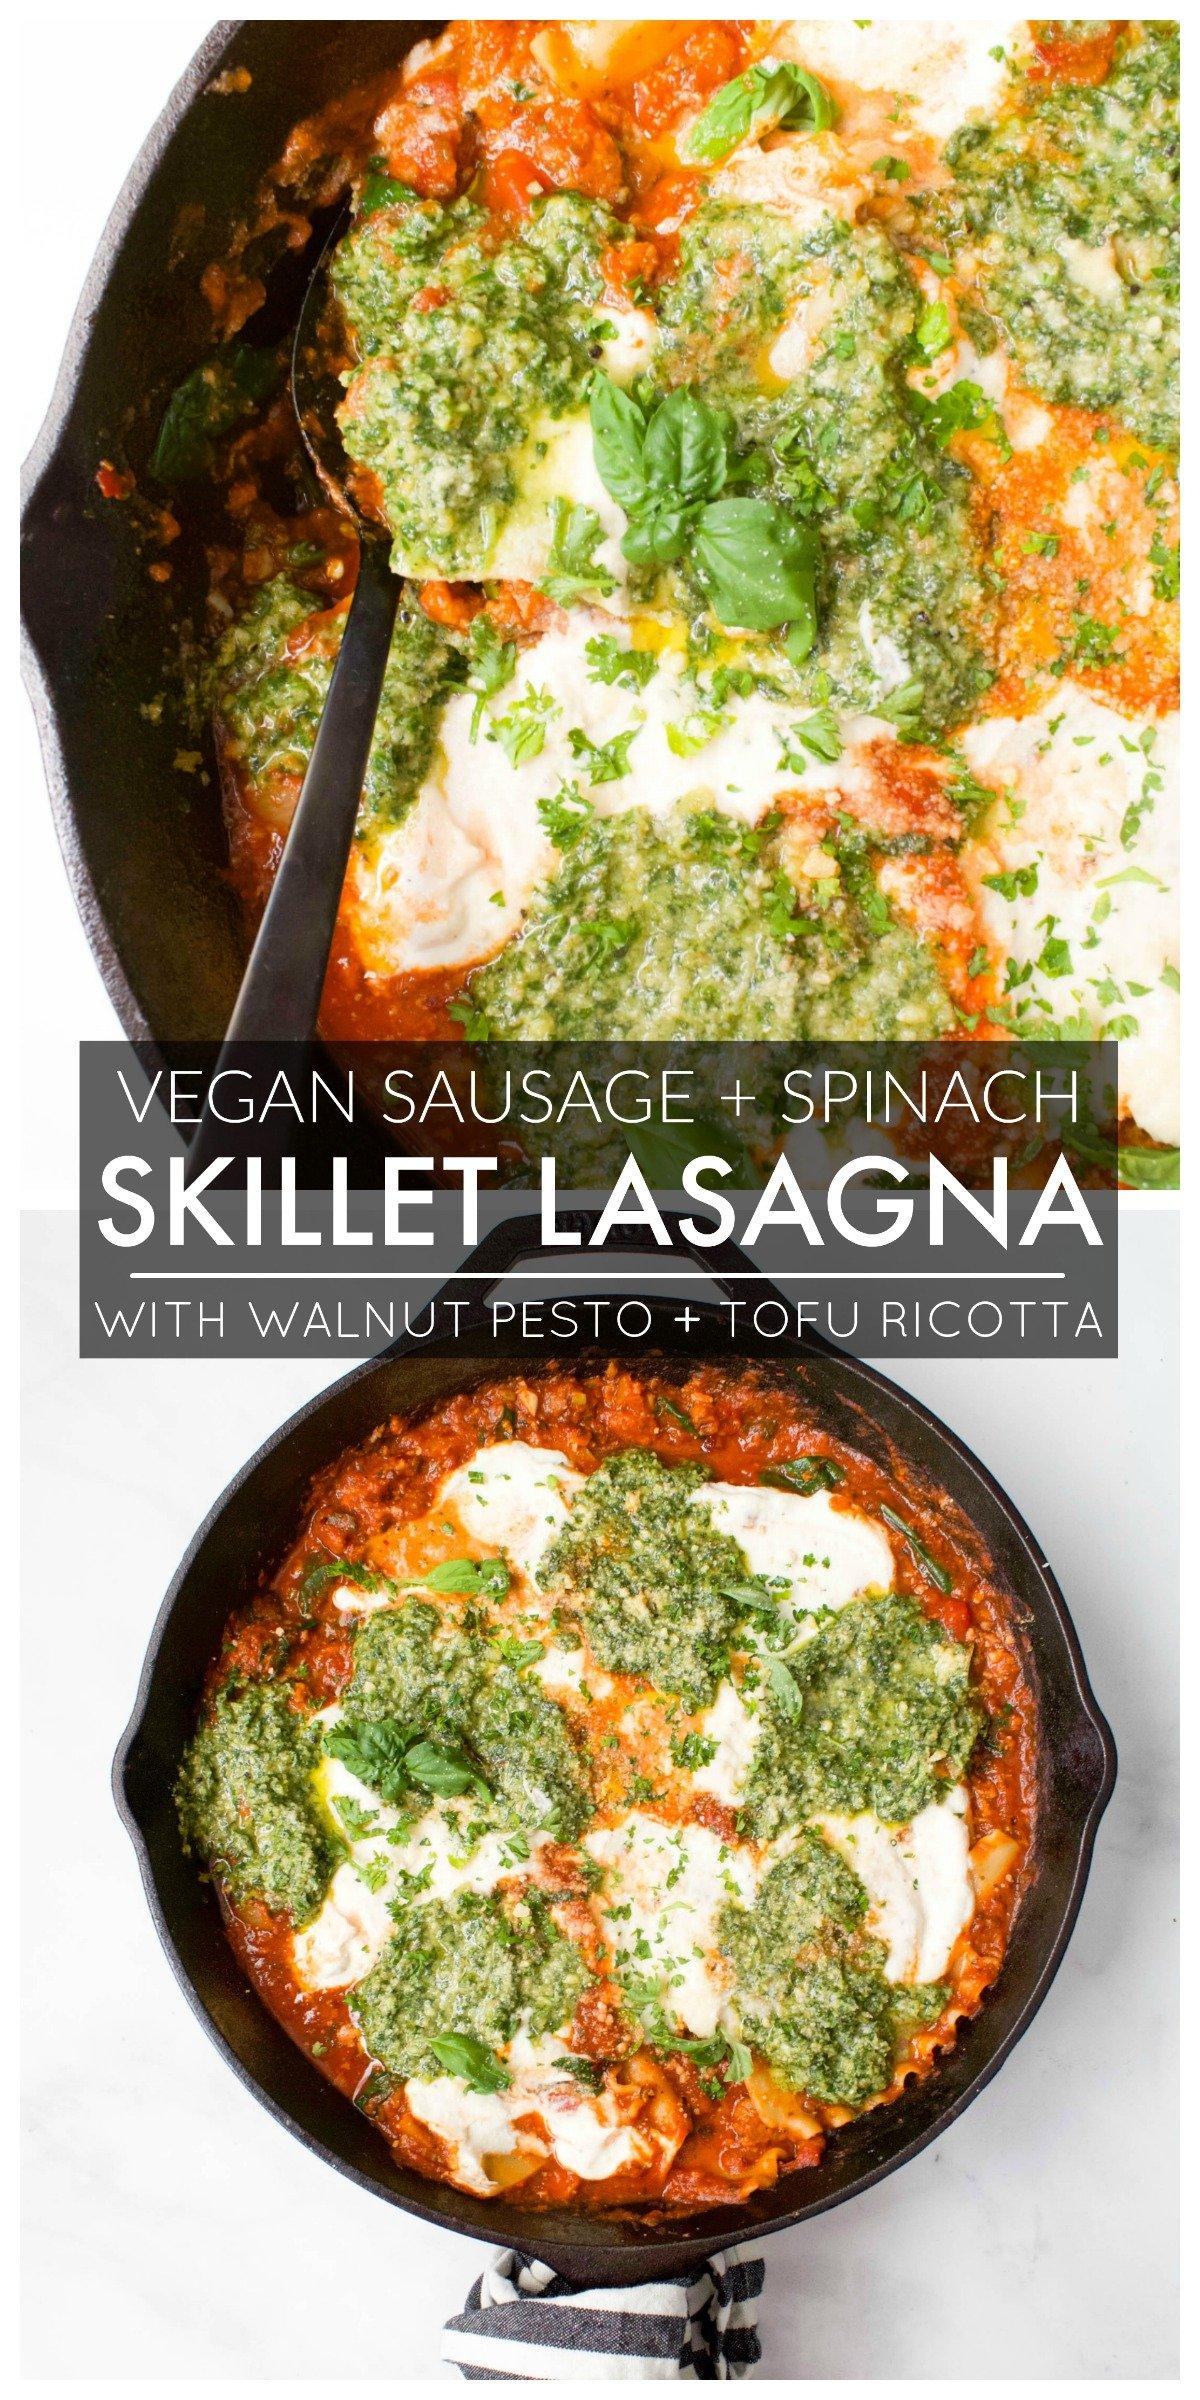 This Vegan Sausage & Spinach Skillet Lasagna is filled with tofu ricotta, fresh pesto and spicy vegan sausage. So freaking tasty! | ThisSavoryVegan.com #thissavoryvegan #veganlasagna #vegan